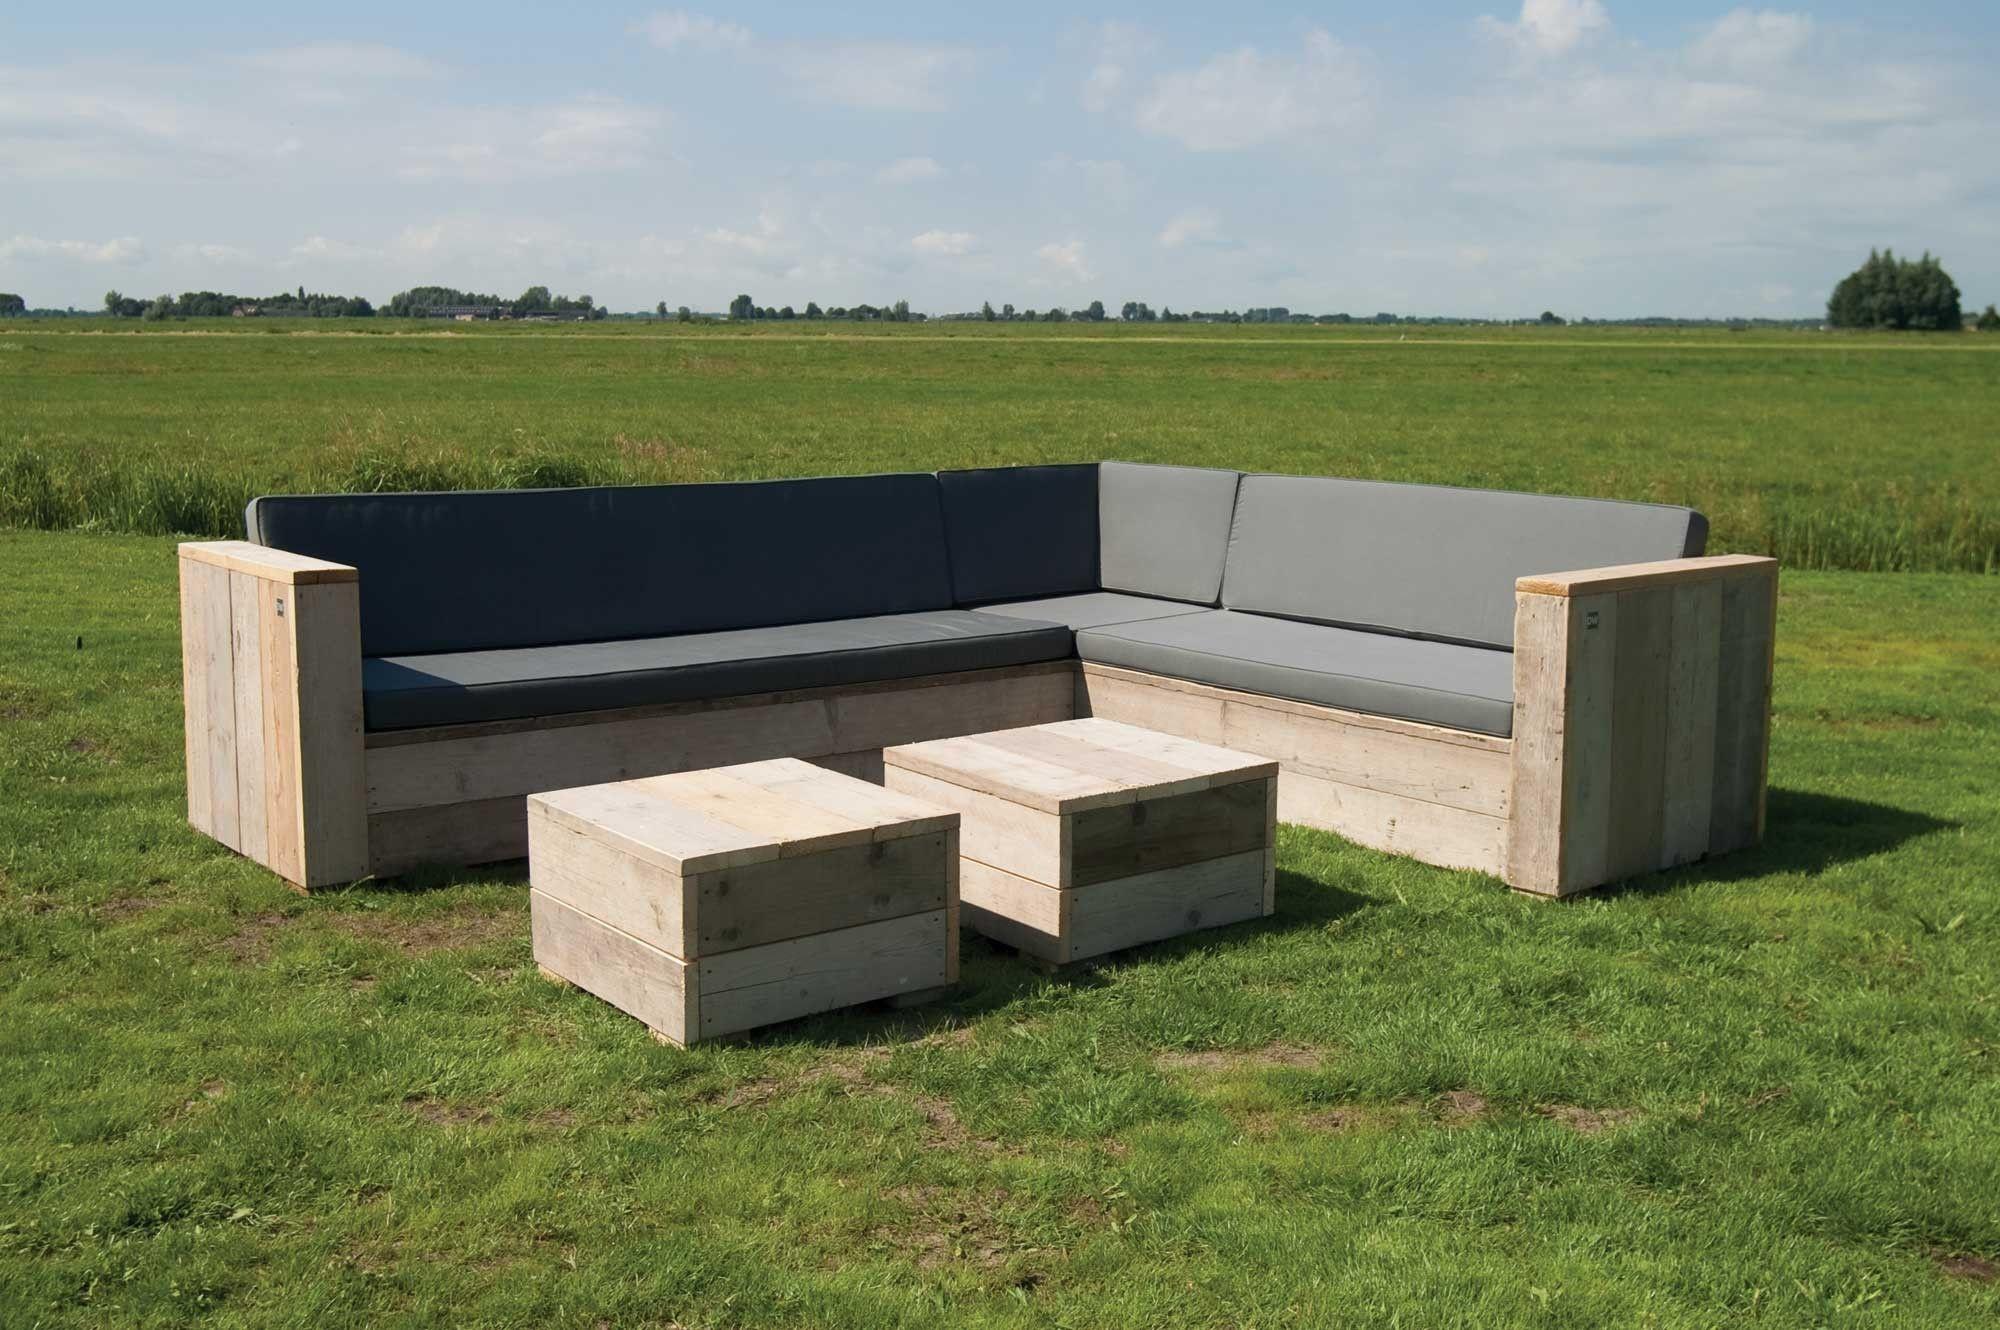 Gartenmöbel Set Holz Lounge ~ Gartenset eckbank aus unbehandeltem gerüstholz mit tisch